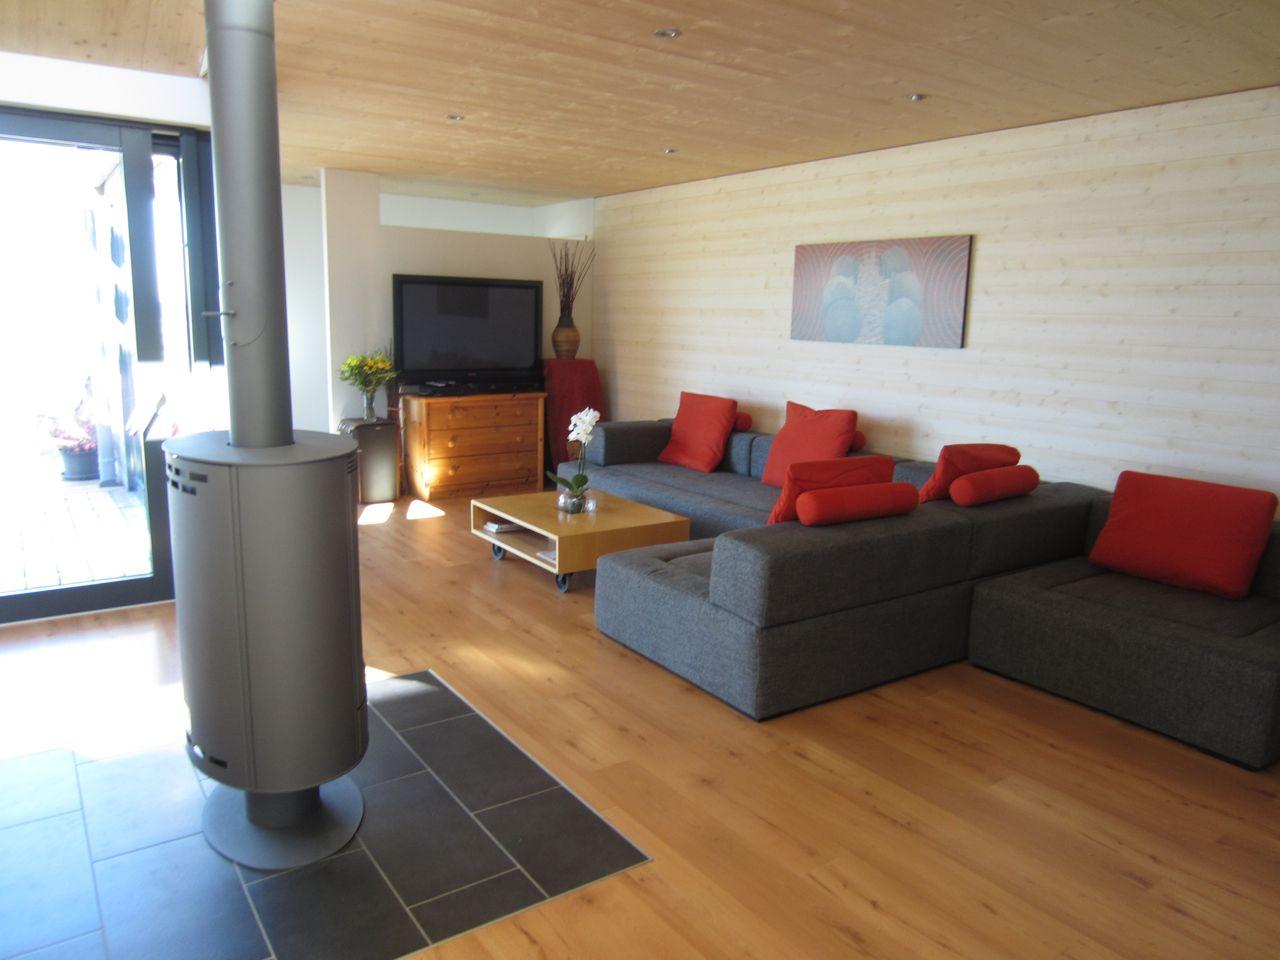 cuisine plafond bas hotte encastr e plafond bas dans. Black Bedroom Furniture Sets. Home Design Ideas